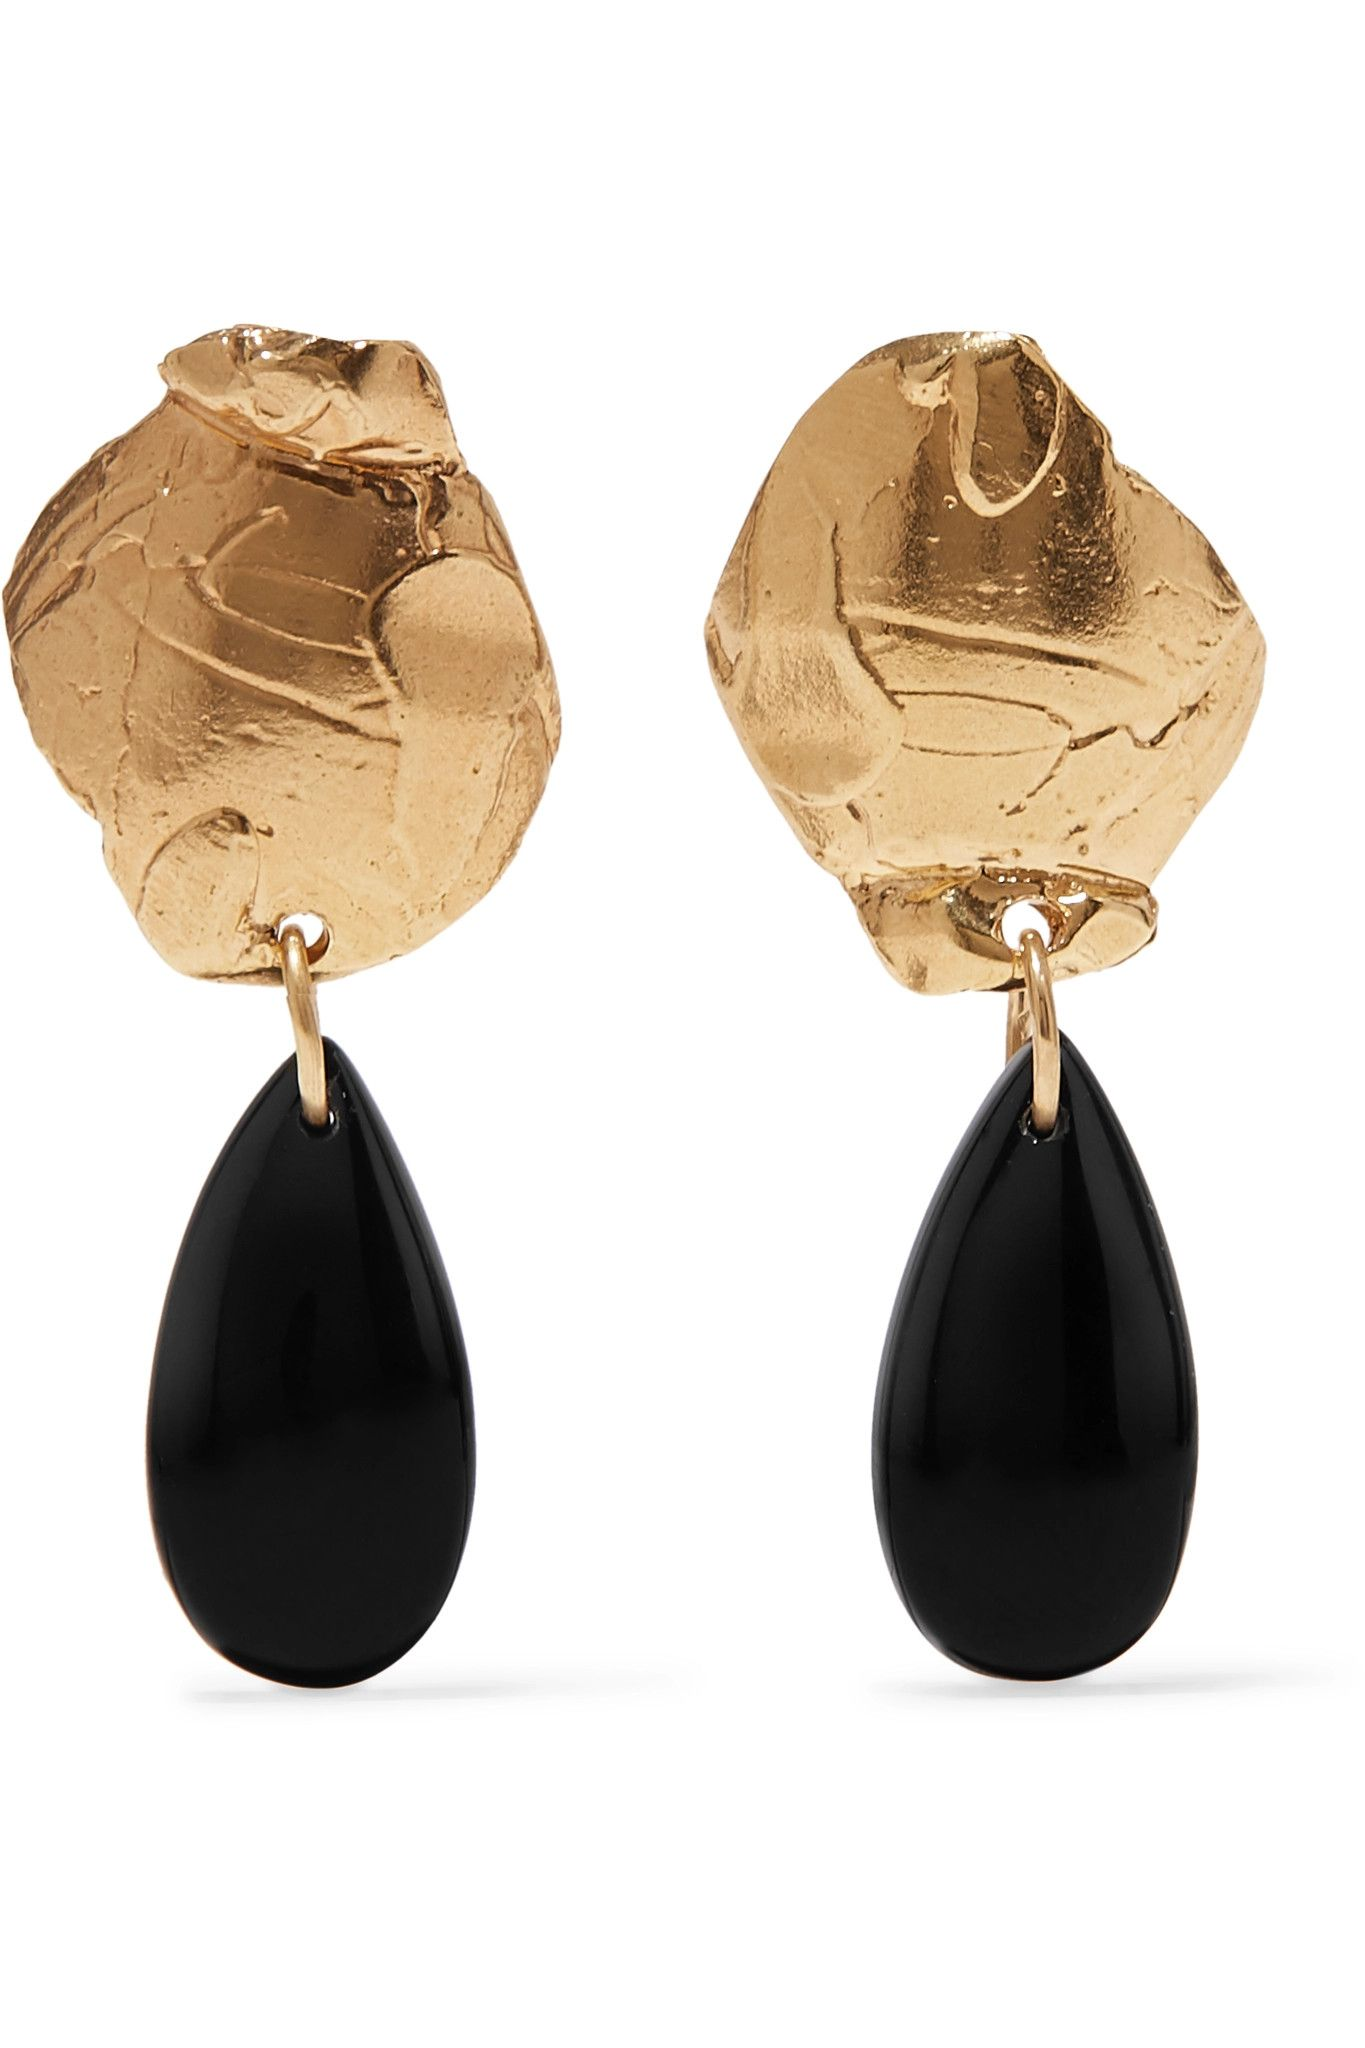 14karat gold and enamel onyx earrings is part of Onyx earrings, Jewelry trends, Fashion jewelry earrings, Earrings, Jewelry, Jewellery and watches -